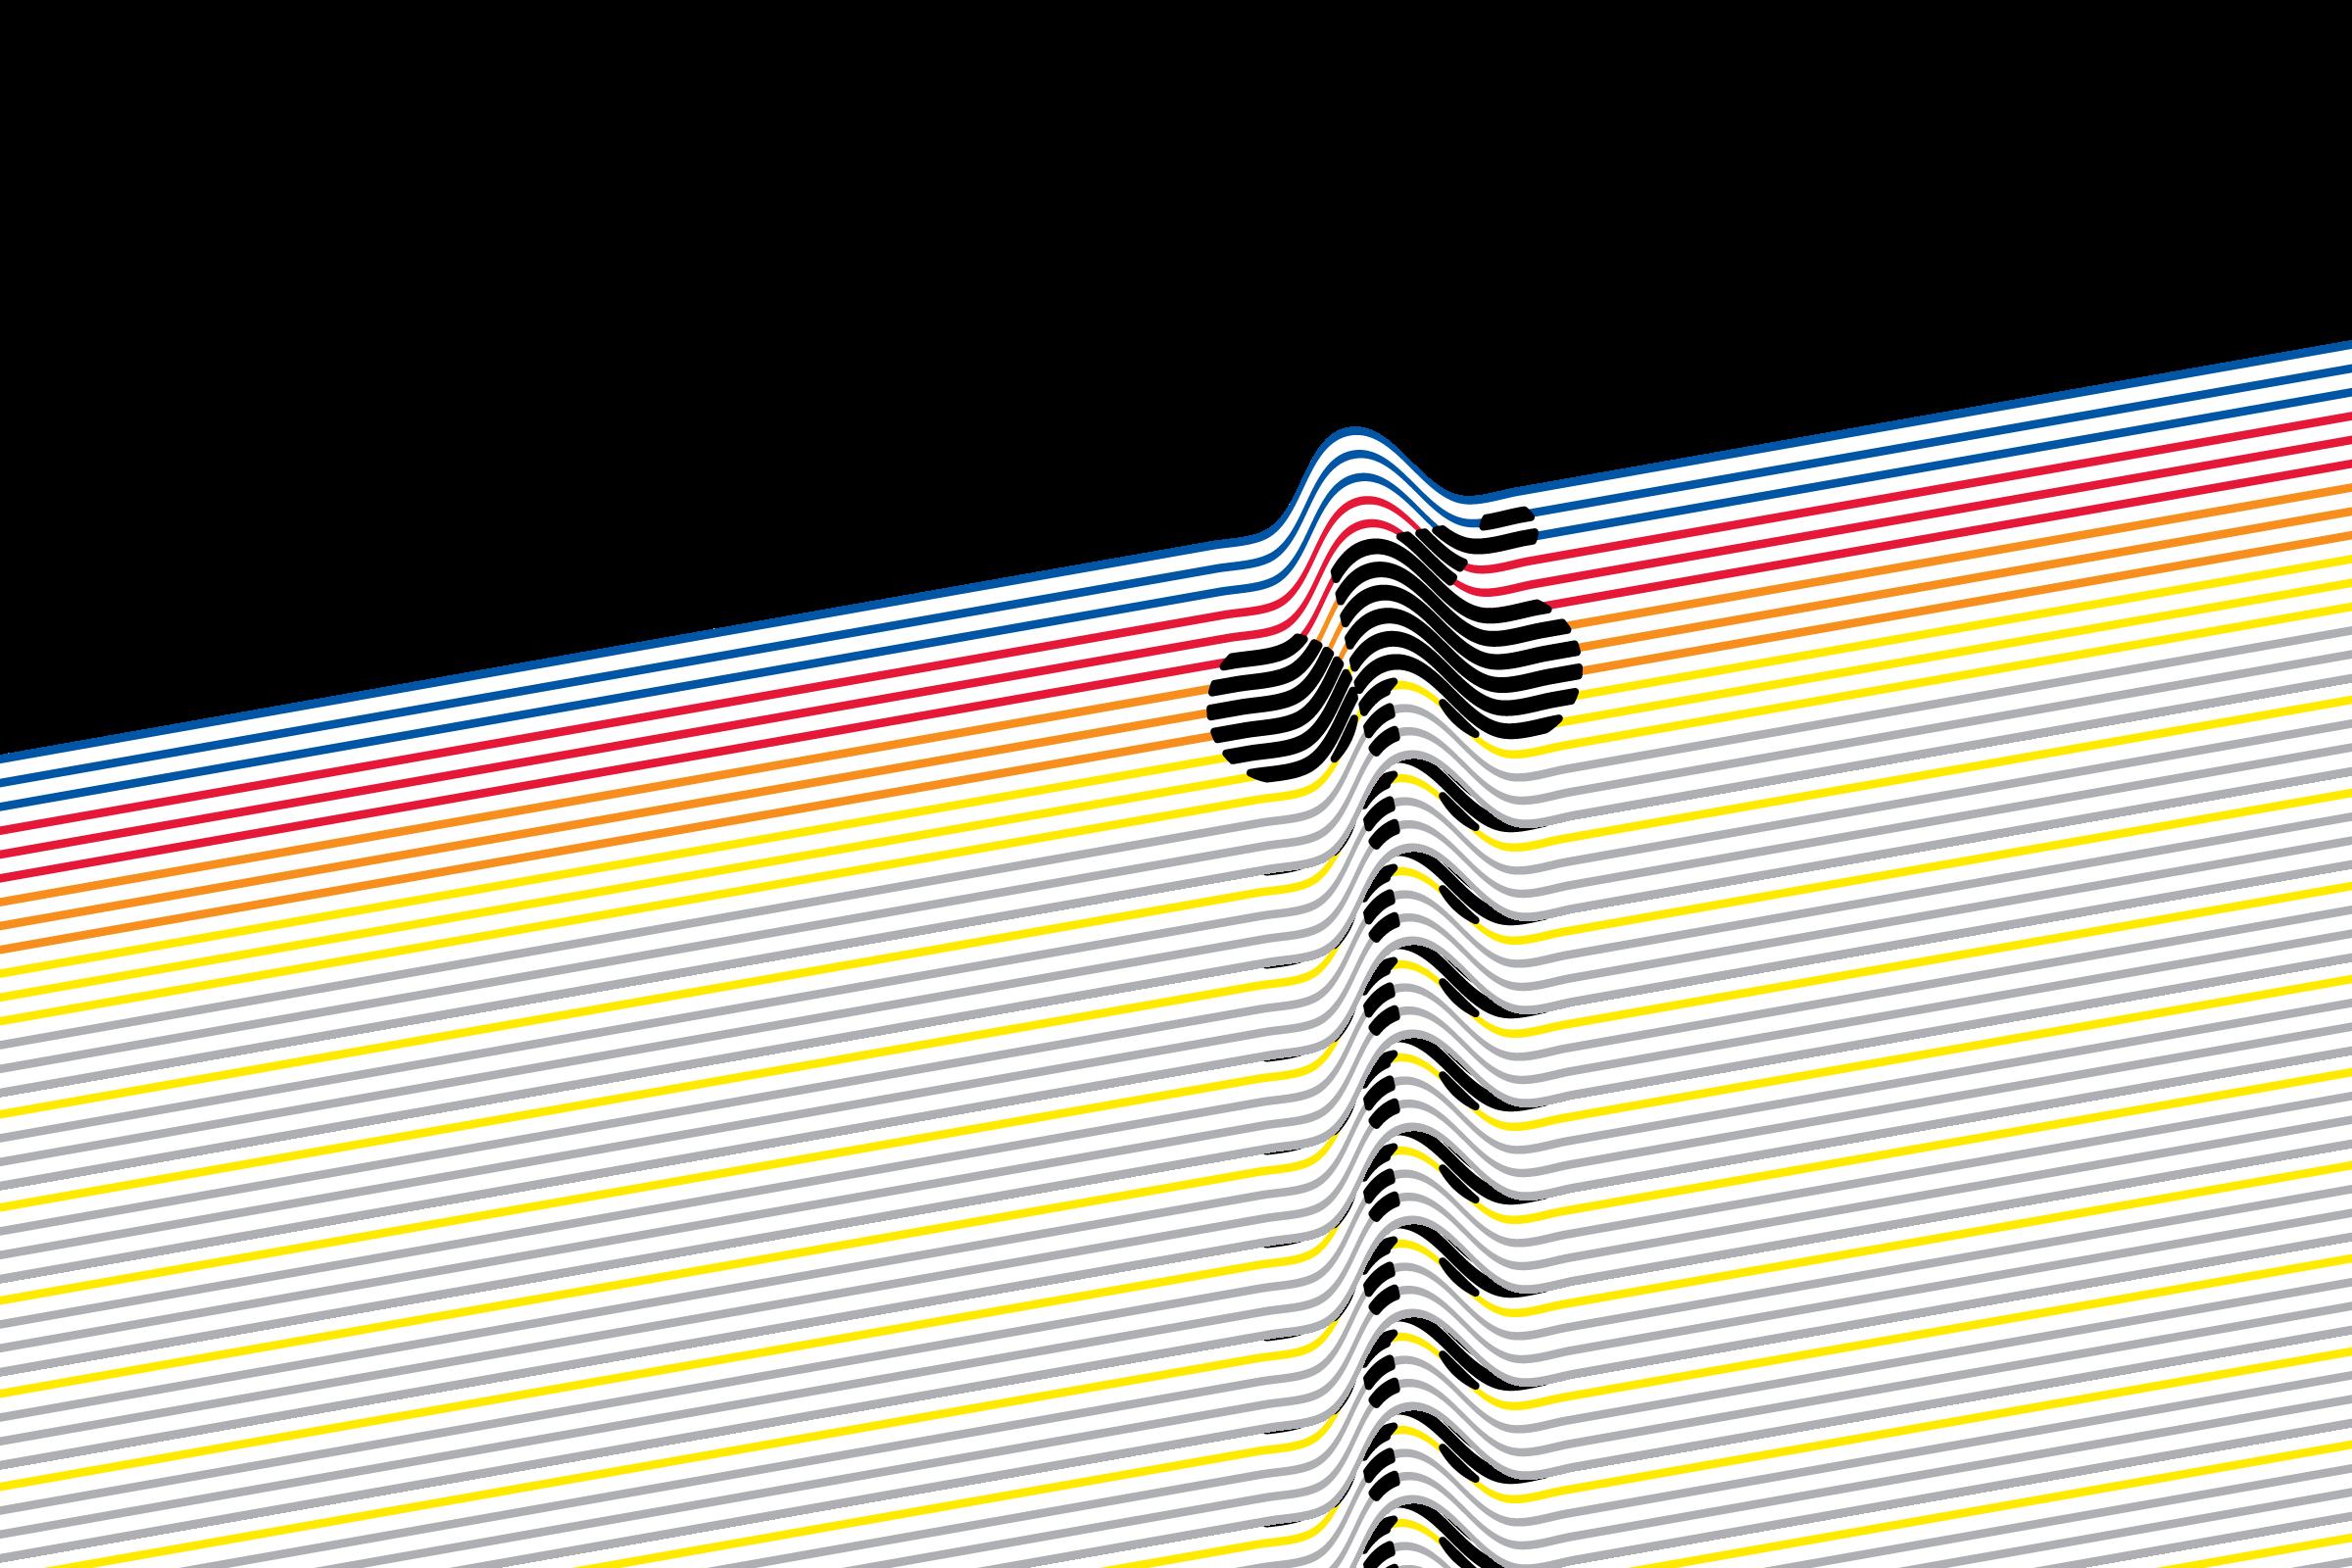 SATURDAY, Sept 21st - Hillclimb World Championships